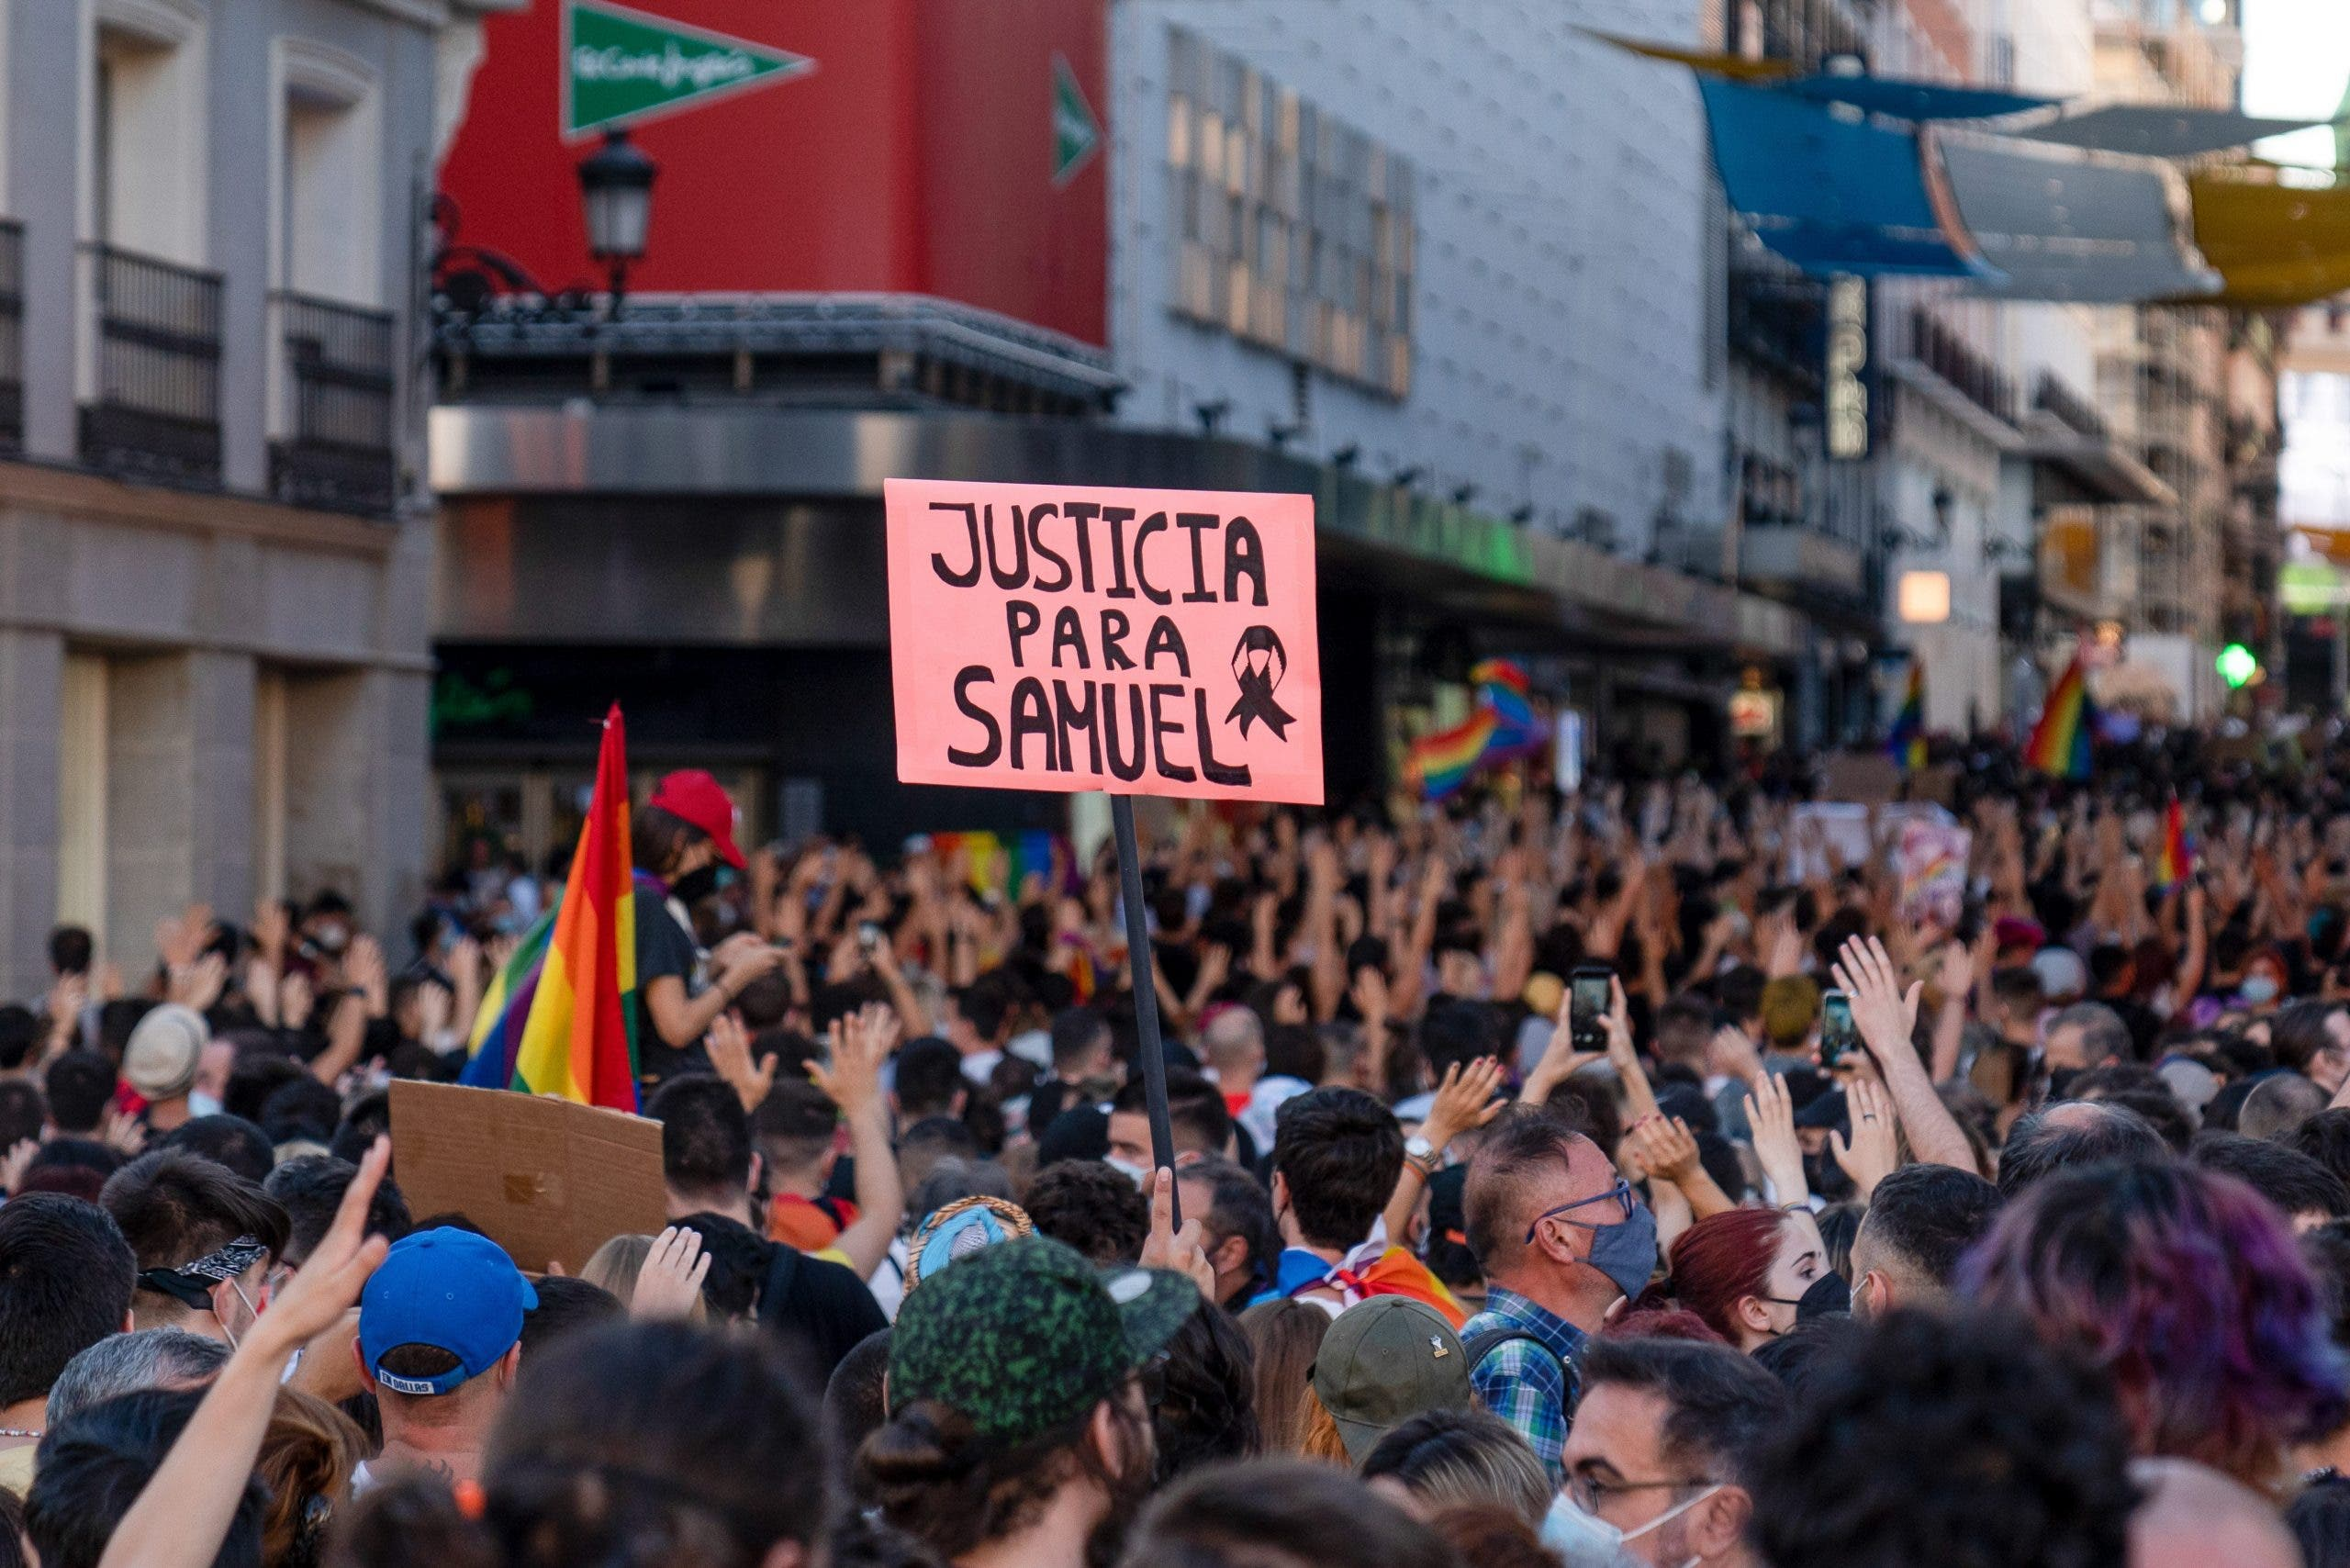 Justice for Samuel